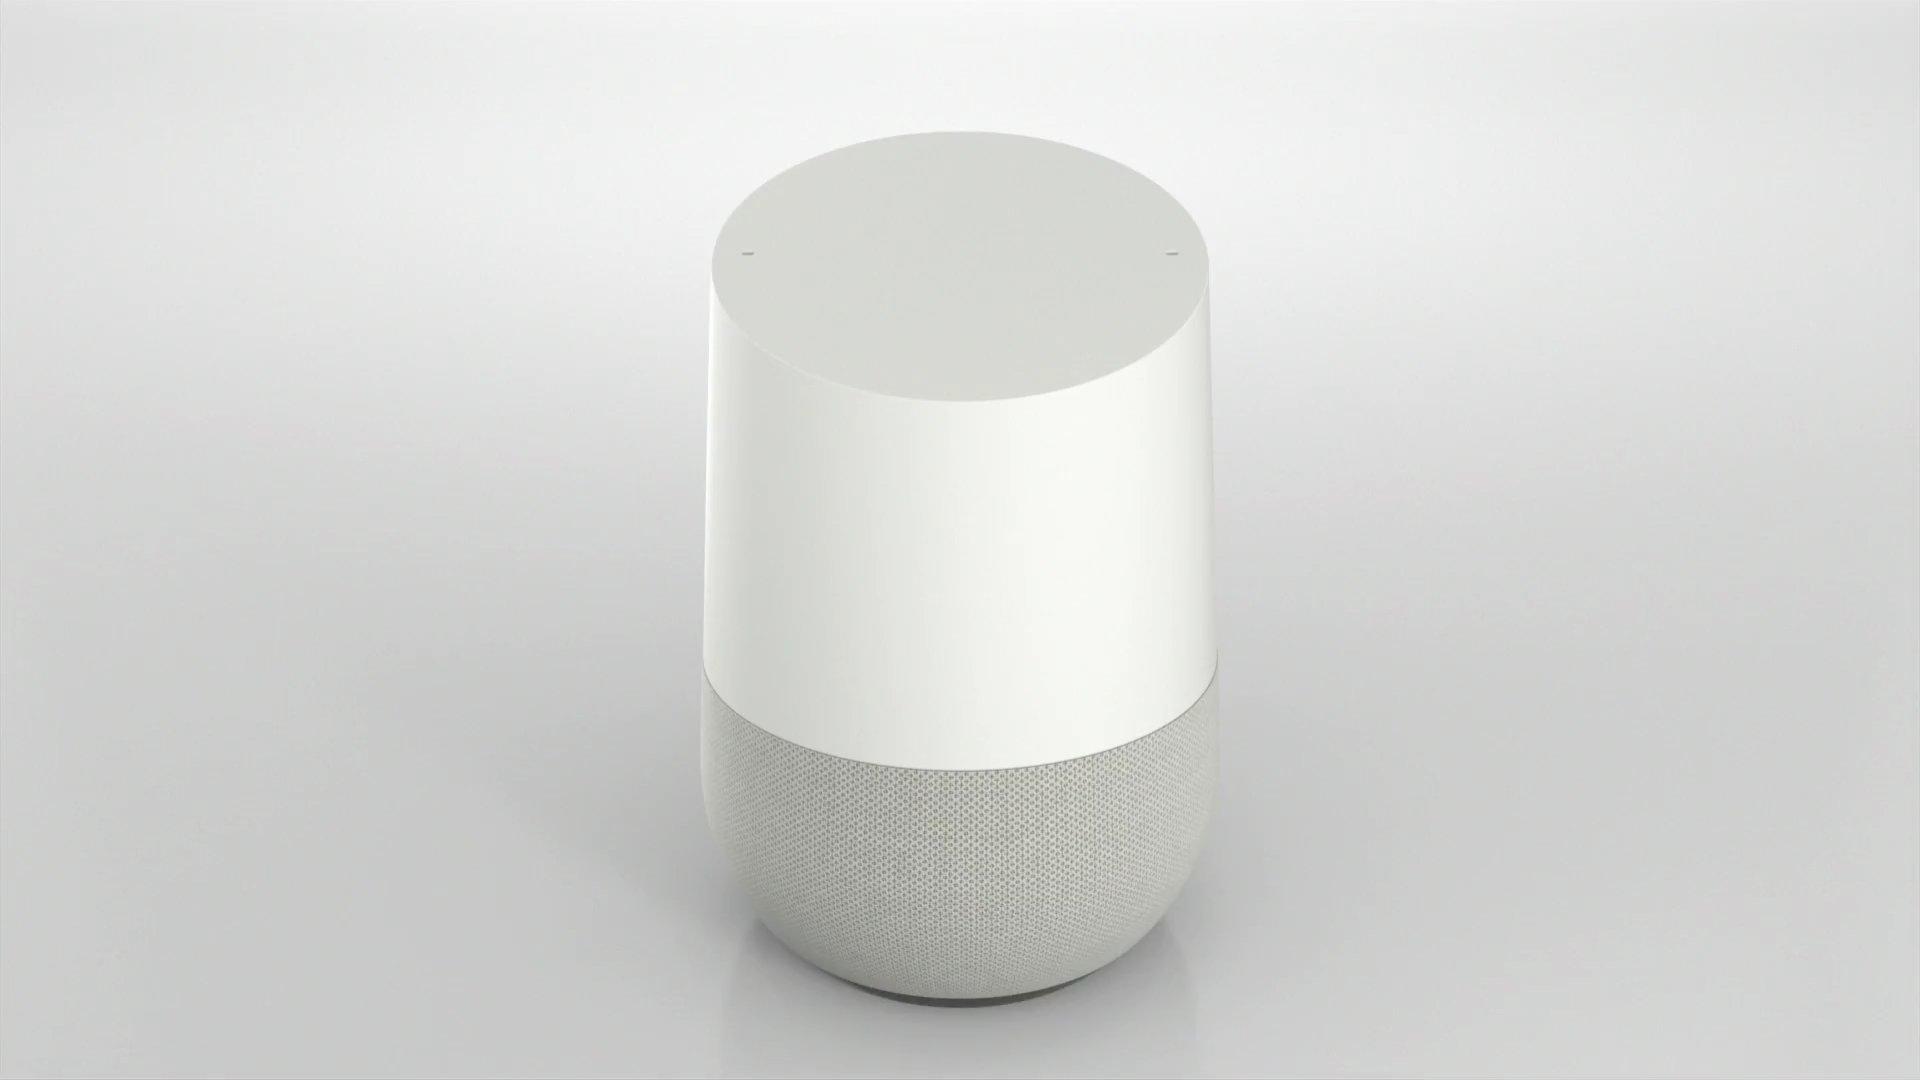 google home konkurrent f r amazon echo kostet 129 dollar. Black Bedroom Furniture Sets. Home Design Ideas